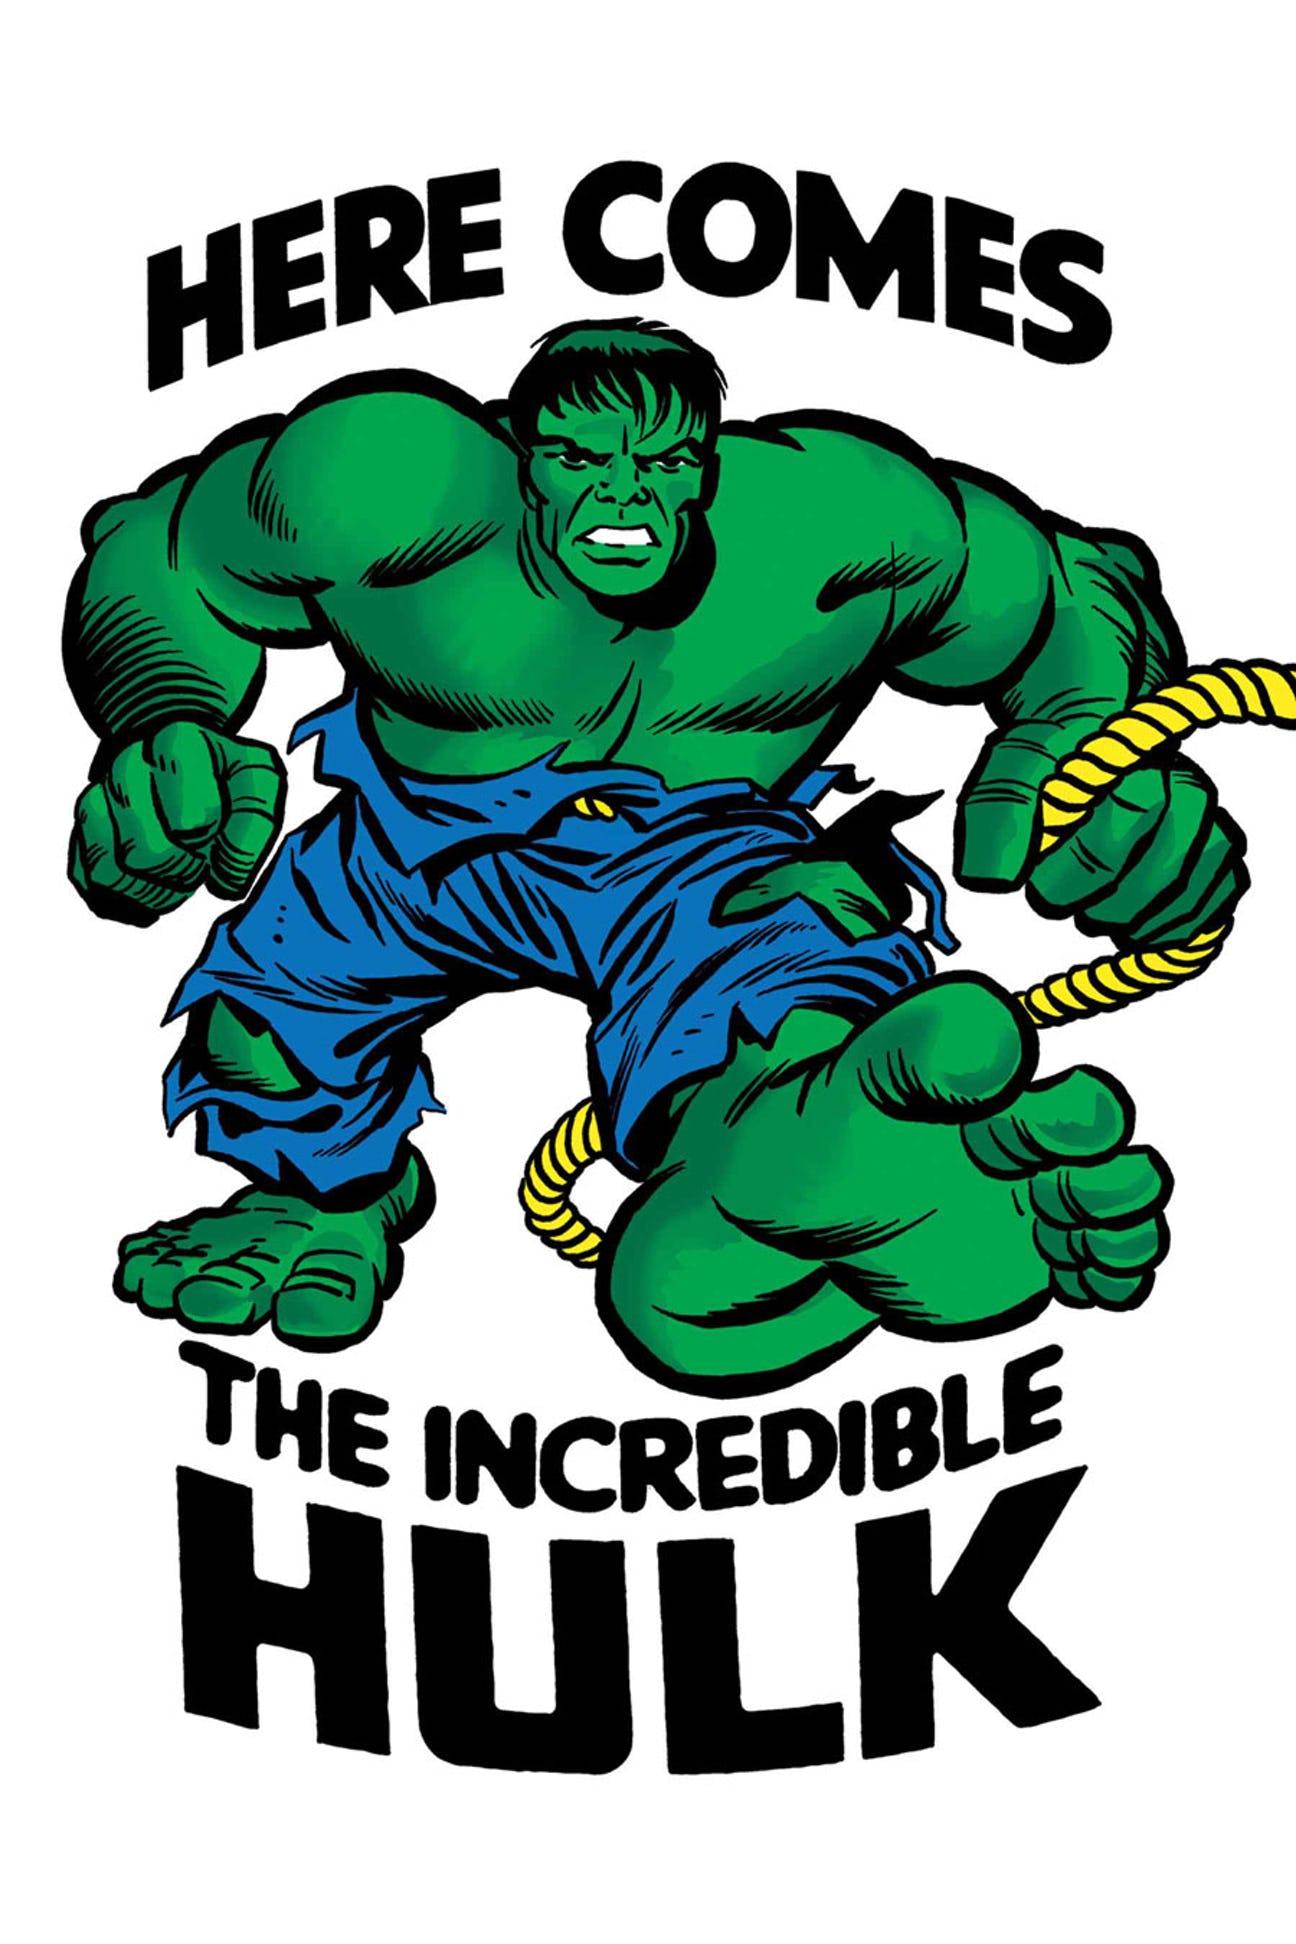 Incredible Hulk Vol 1 709 1965 T-Shirt Variant.jpg